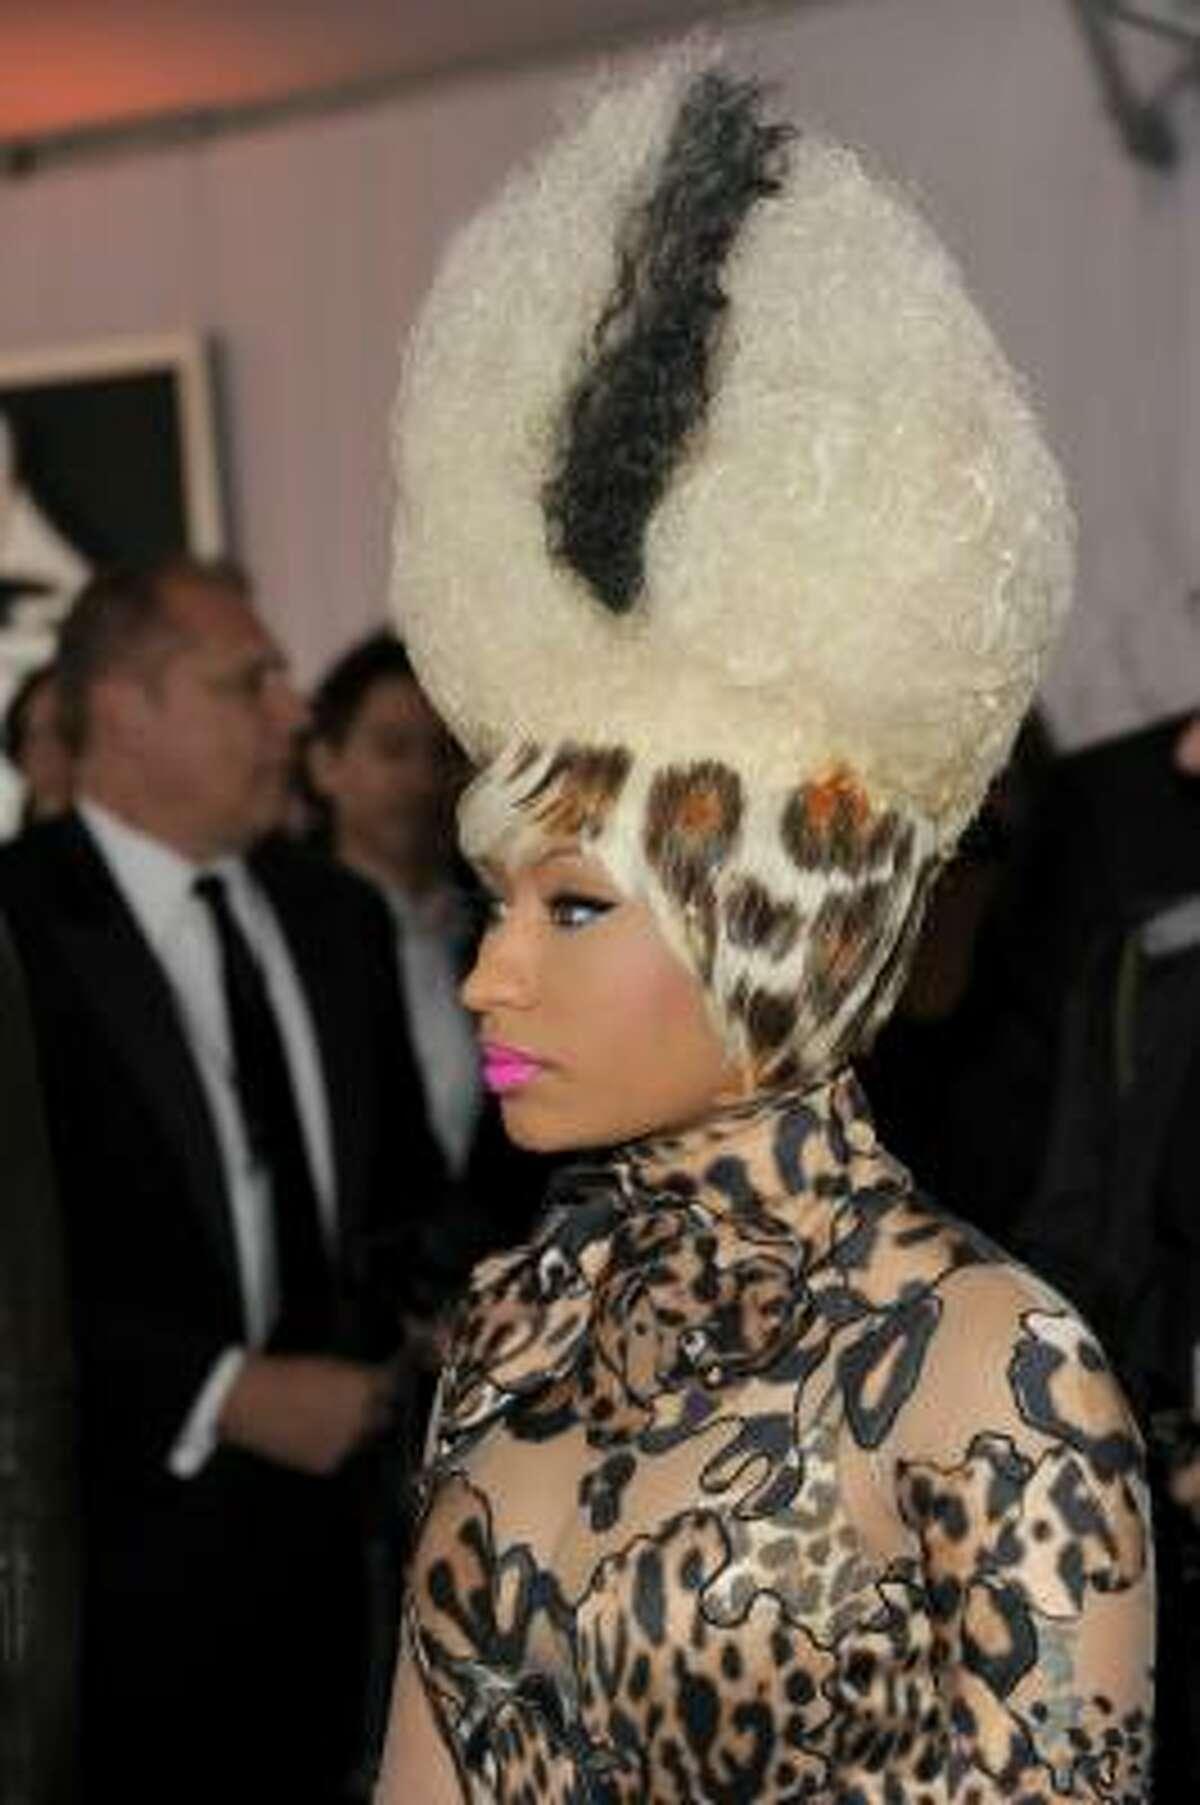 Rapper Nicki Minaj arrives at The 53rd Annual GRAMMY Awards held at Staples Center.